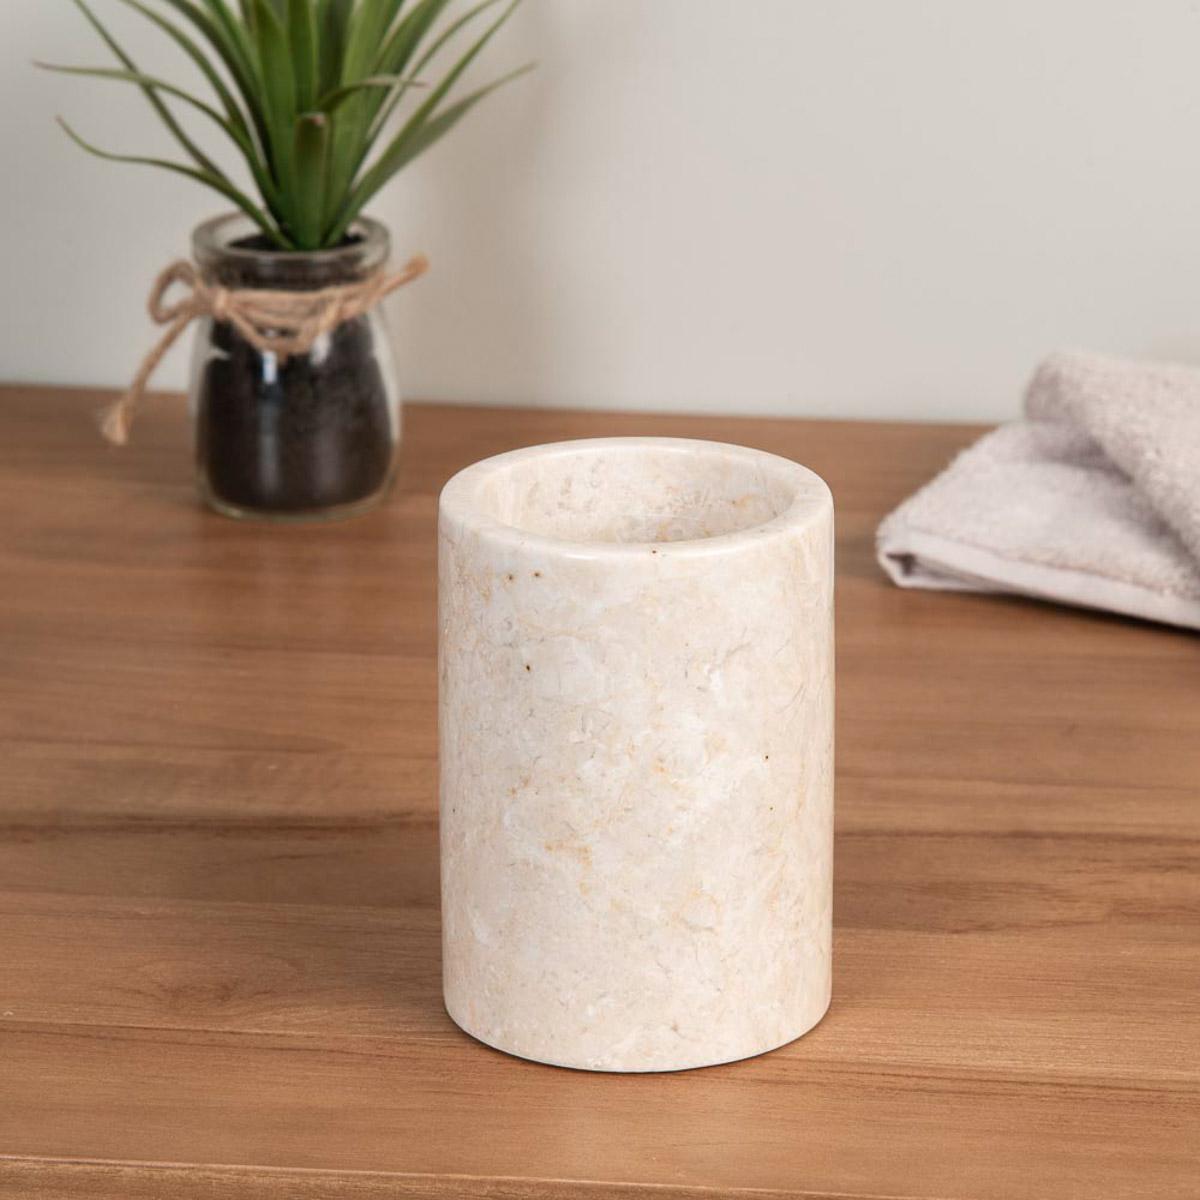 Gobelet de salle de bain en marbre cr me d 7 5 cm for Accessoire salle de bain marbre